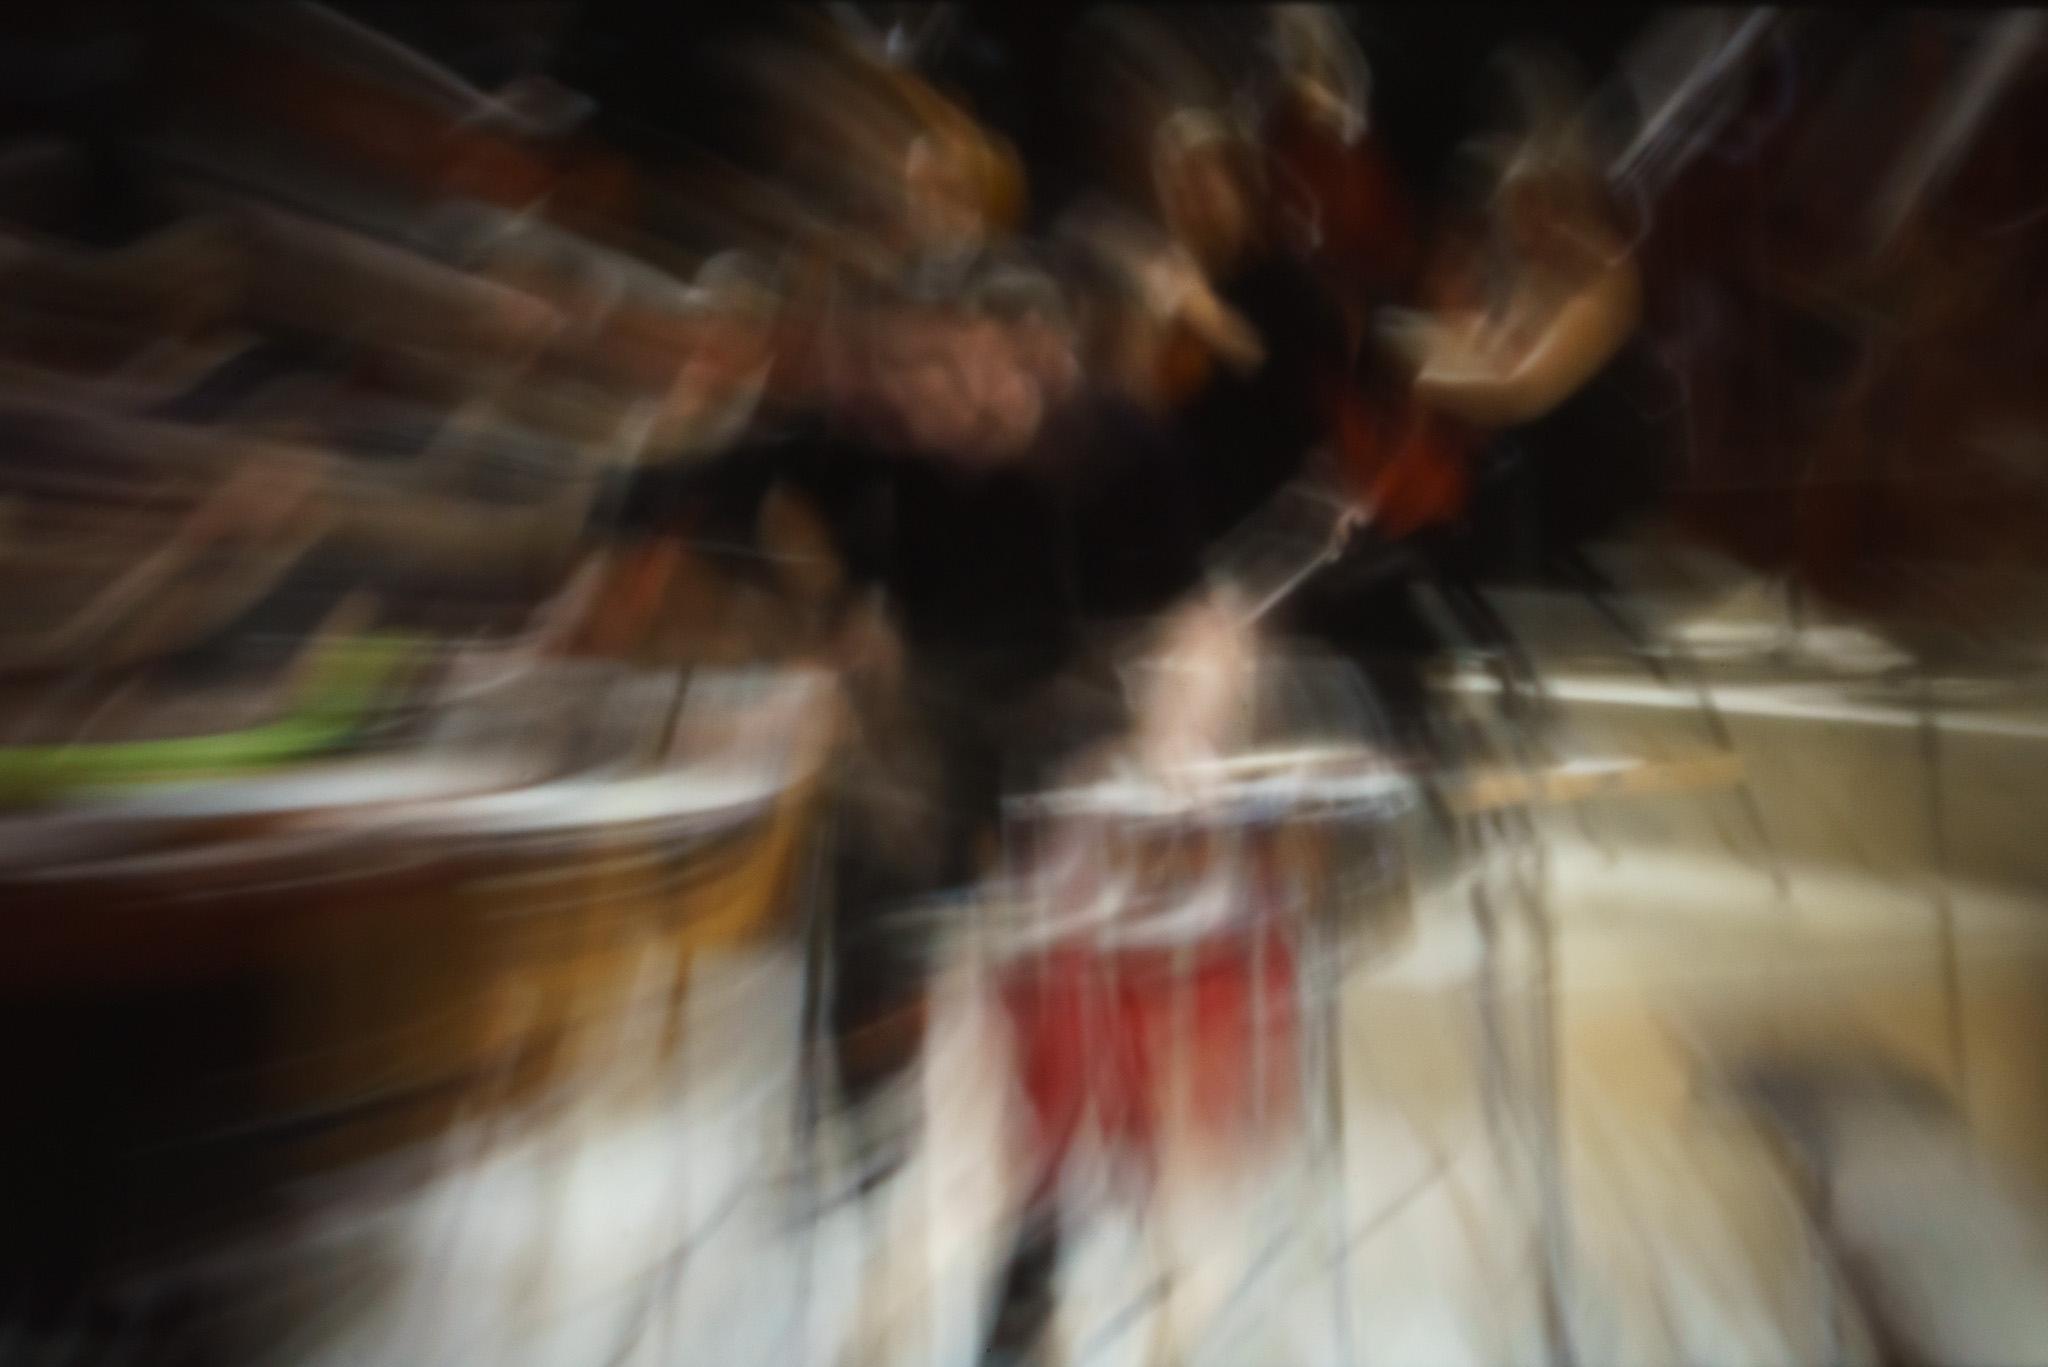 Concerto_Grosso_(15_von_16)